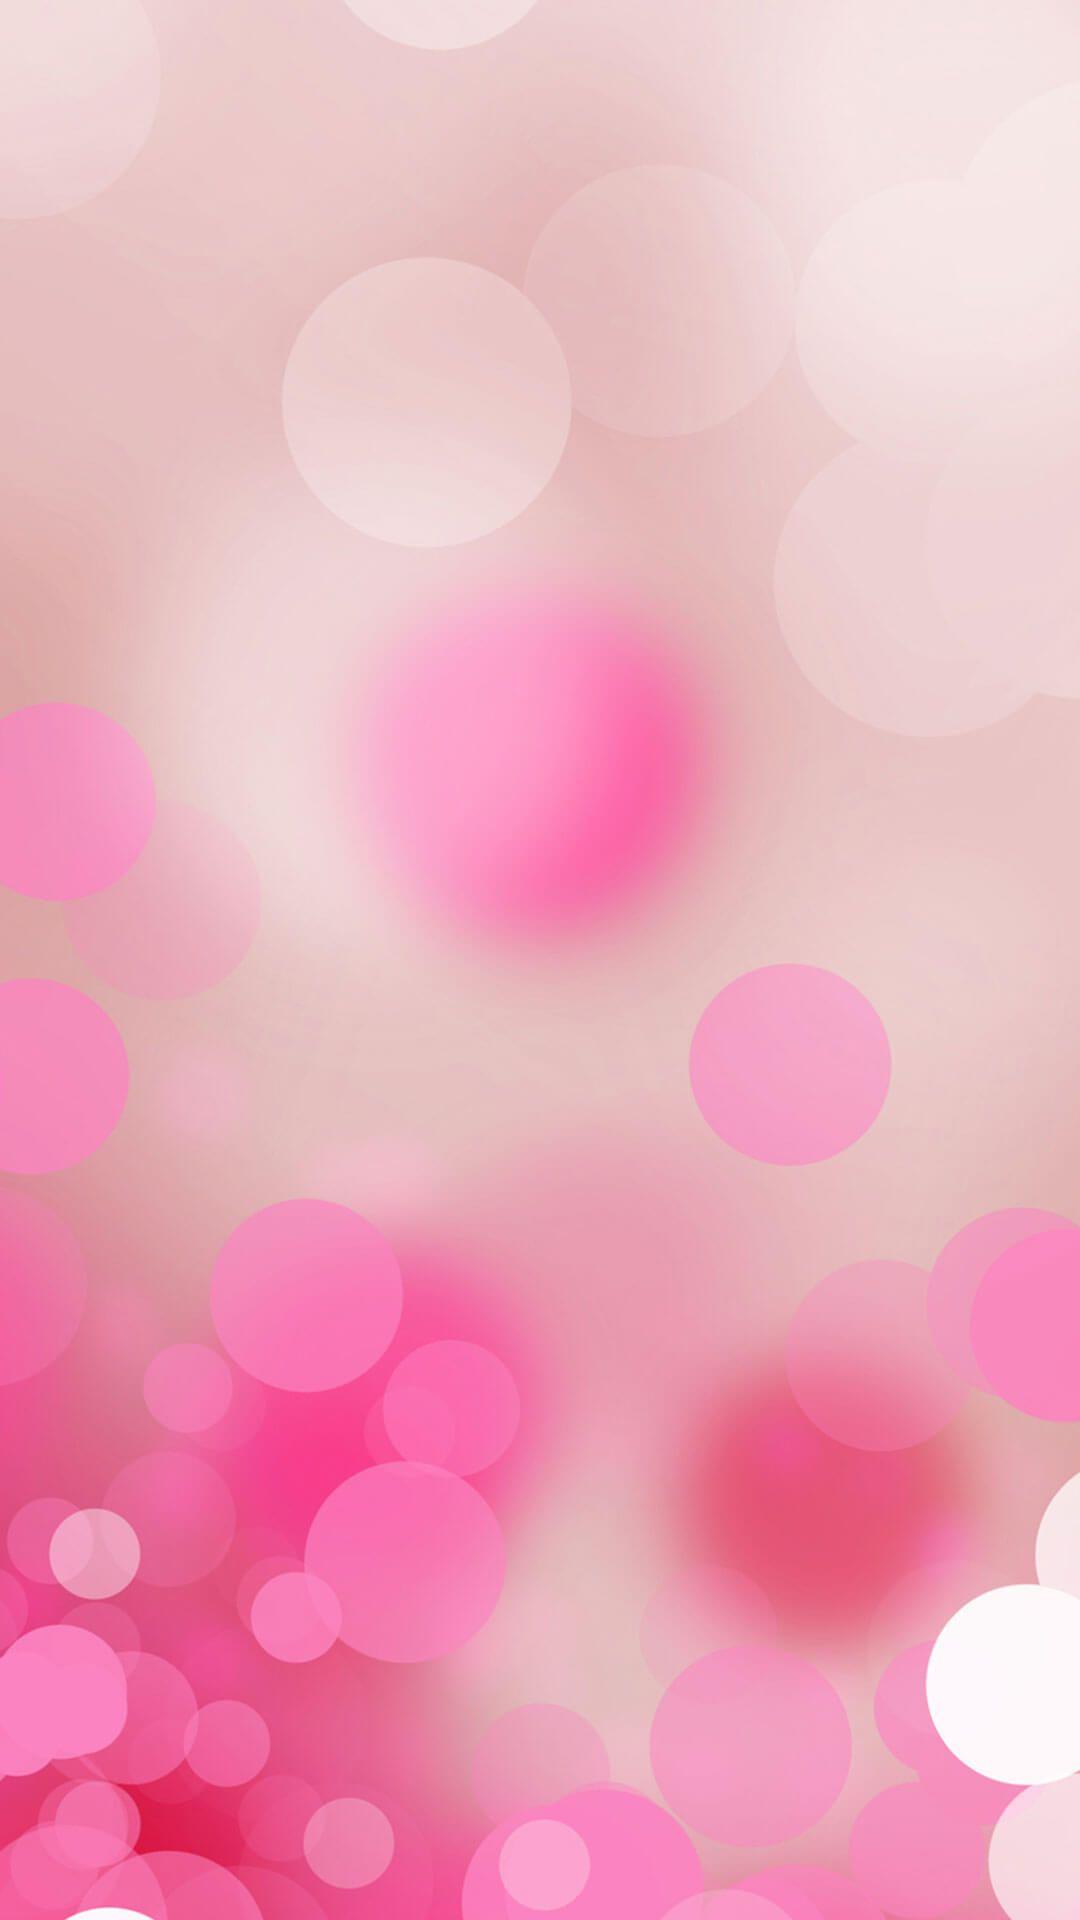 Cool Pink iPhone 6 Wallpaper Tumblr HD Iphone wallpaper